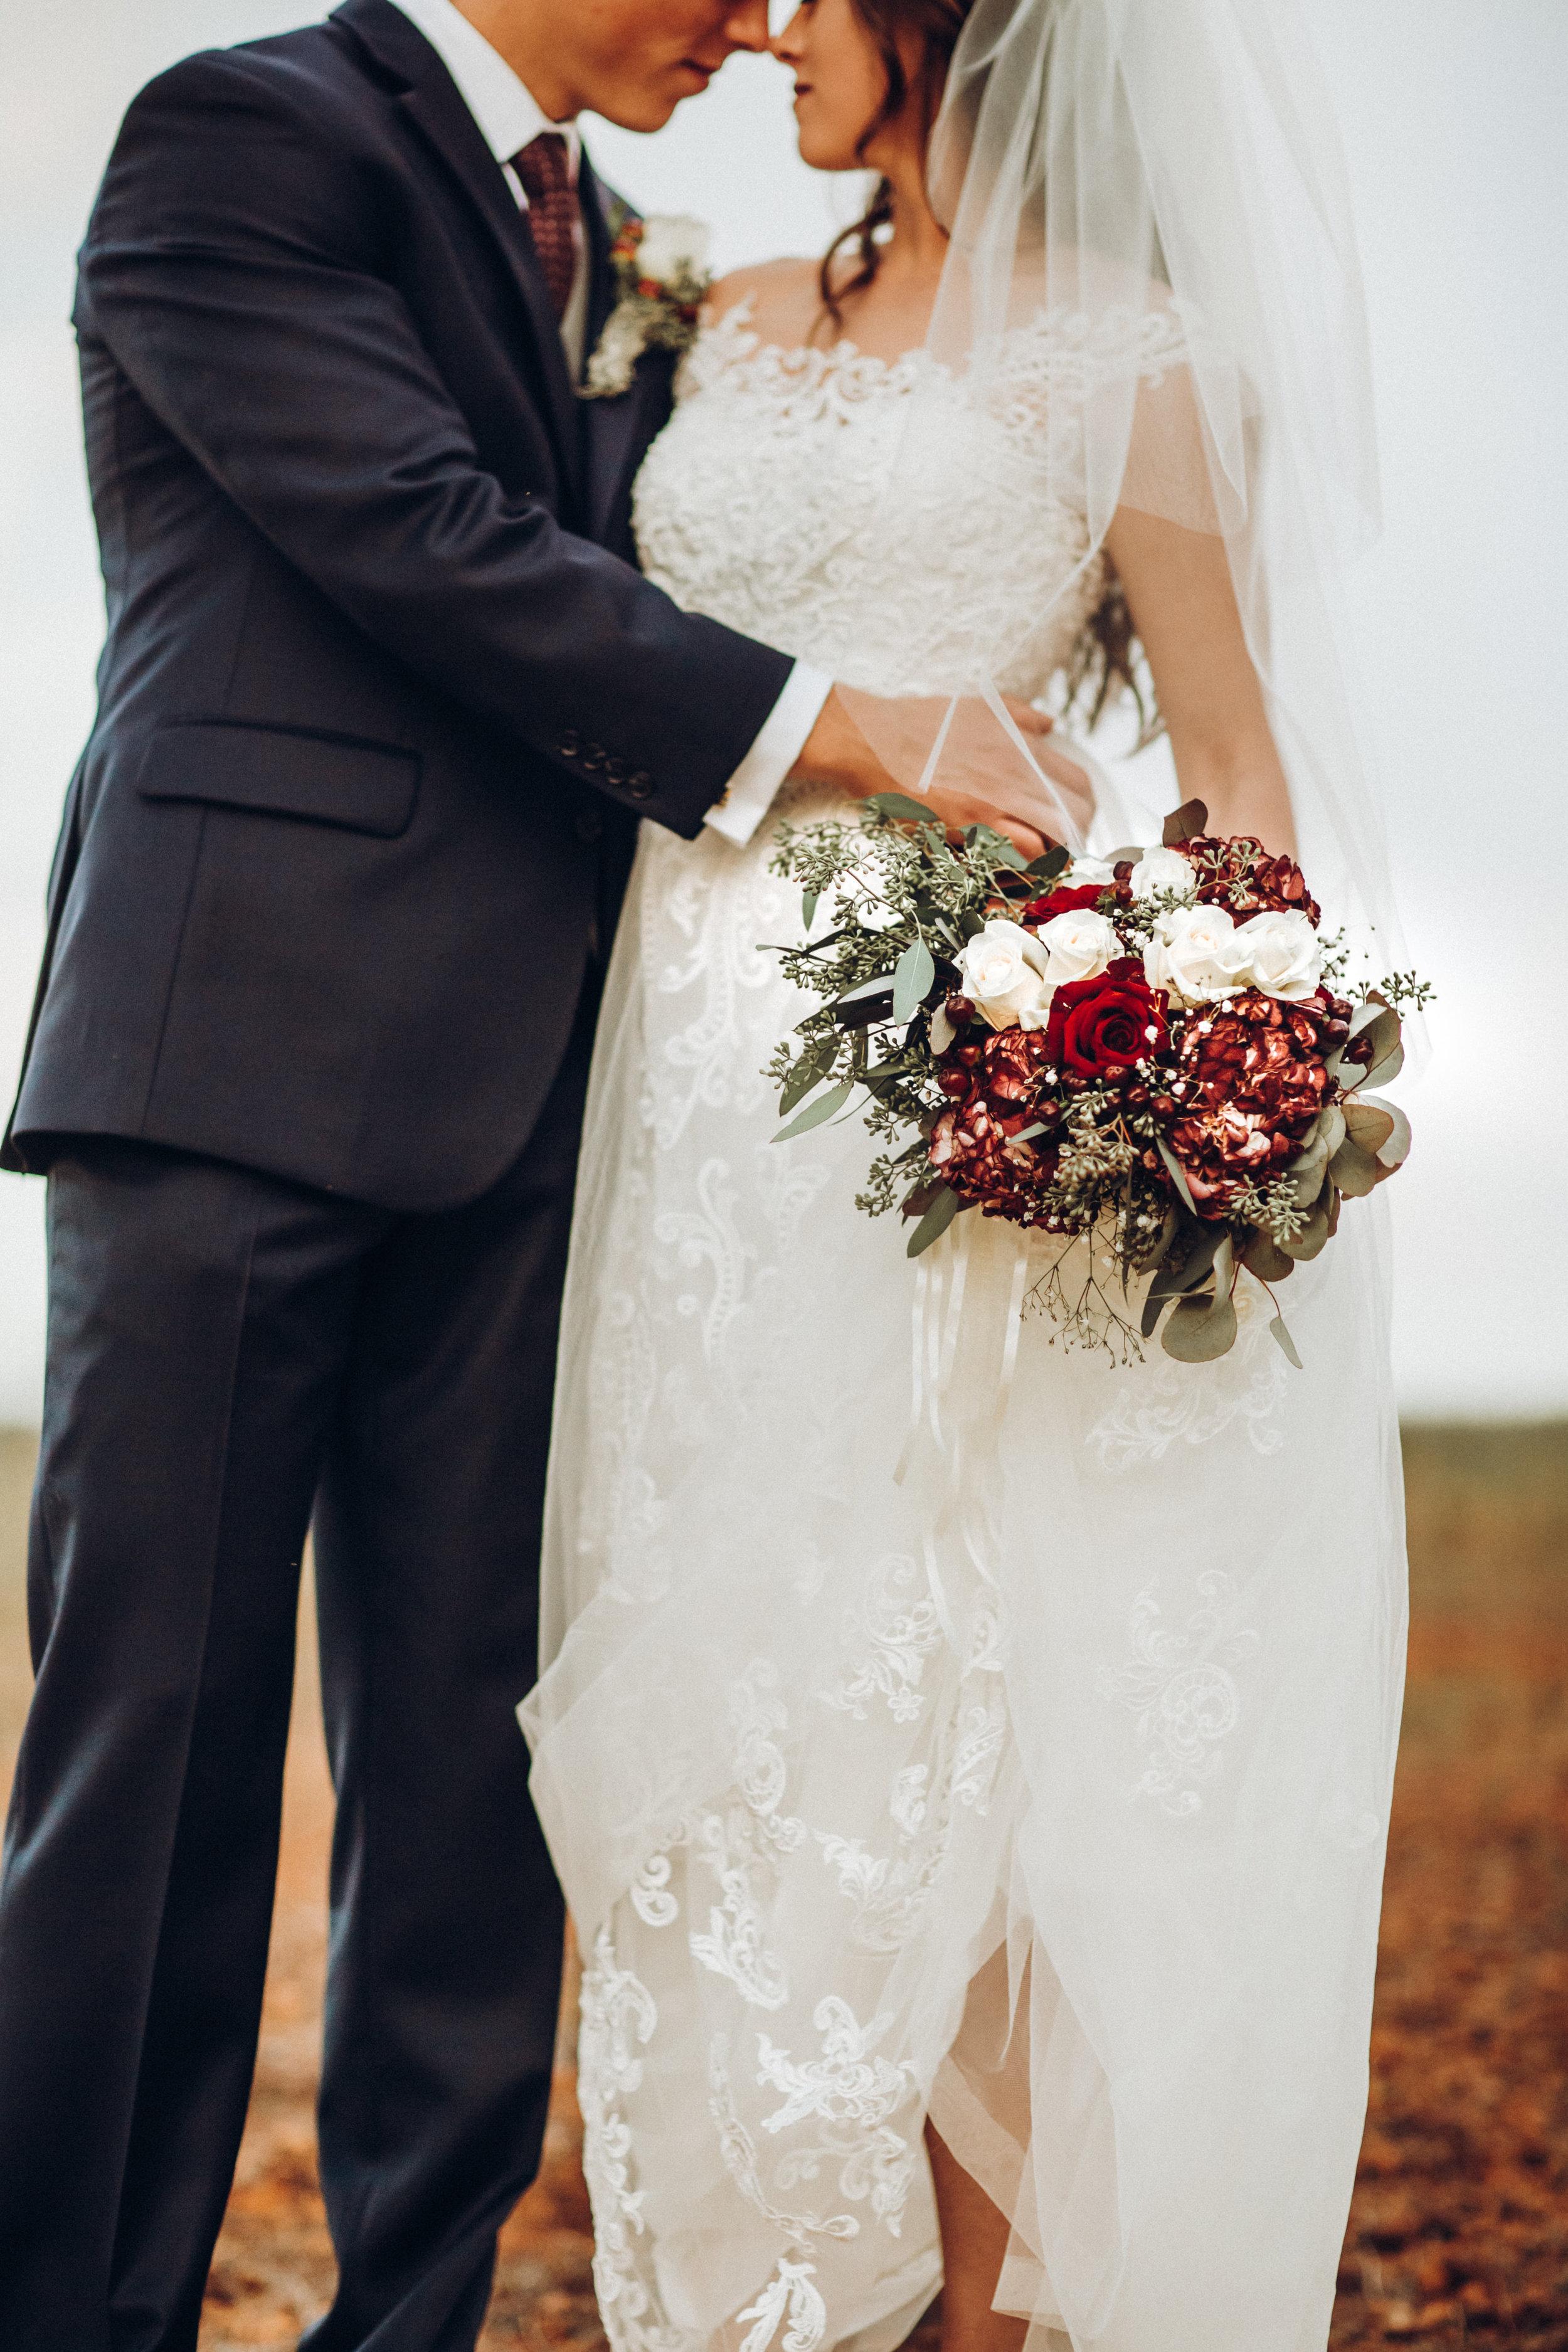 7. Bride + Groom -  Romantic Backyard Farm Wedding - Lauren+Daniel 021.jpg